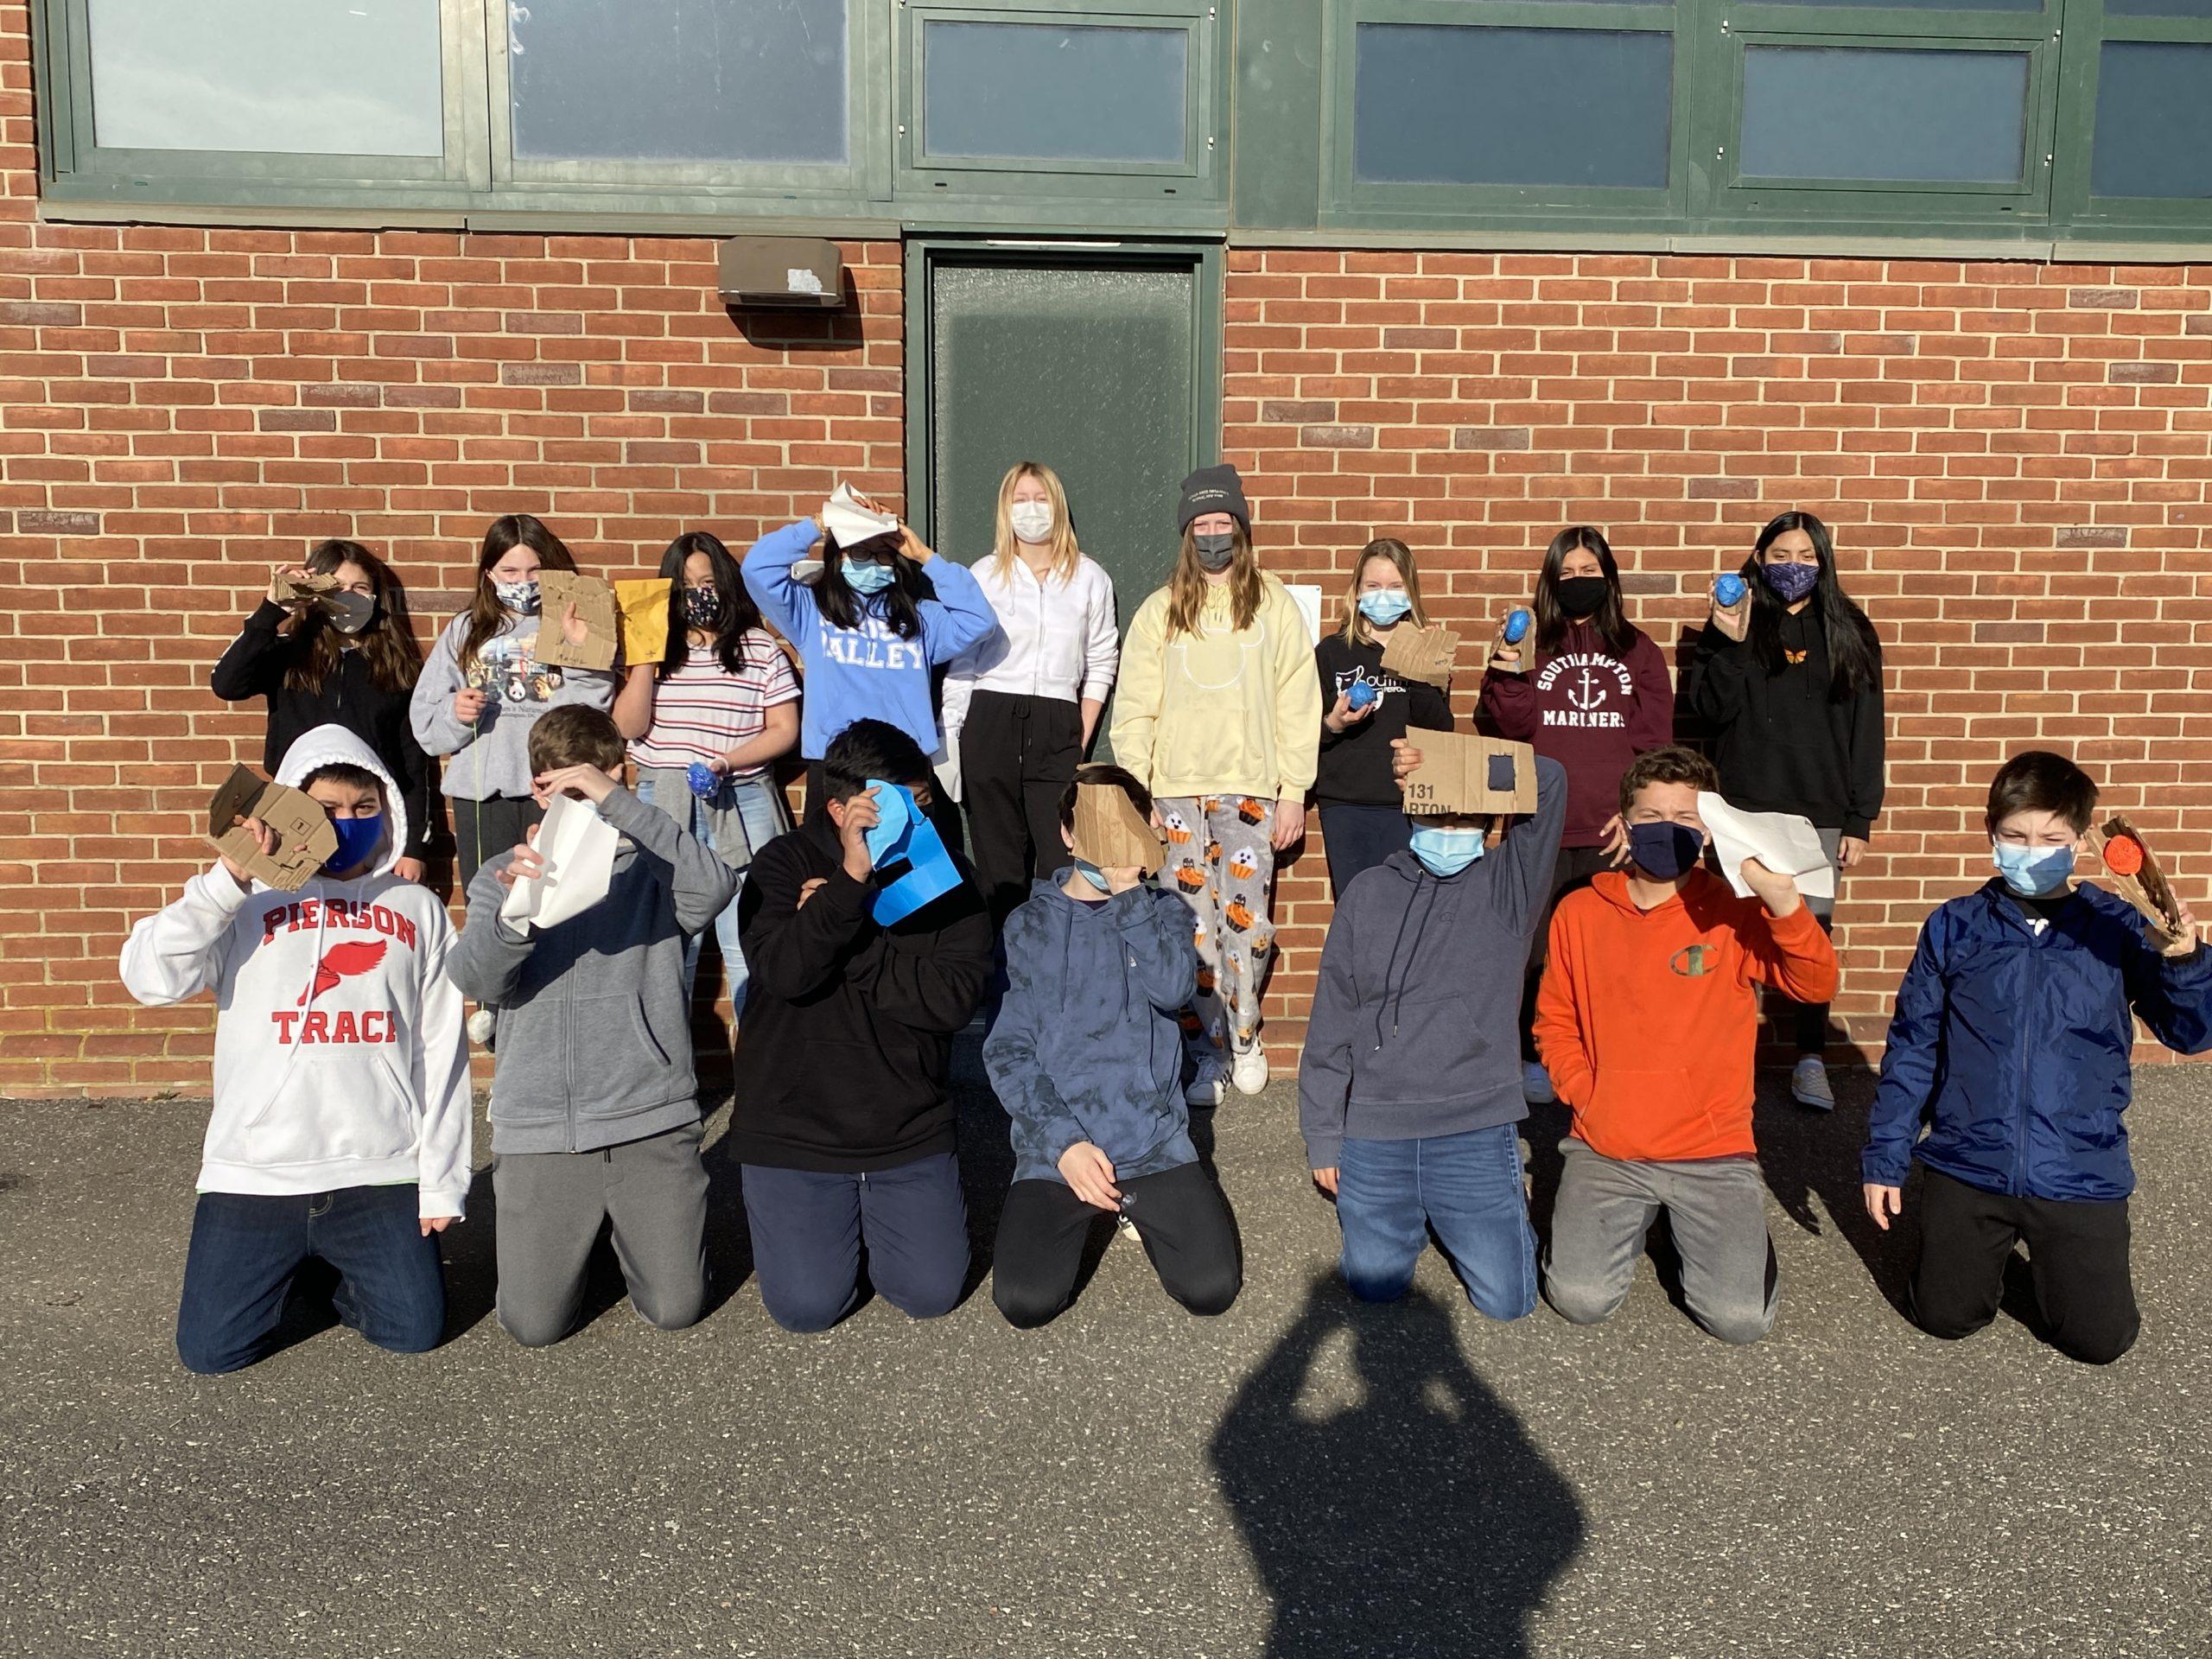 Southampton Intermediate School students designed baseball gloves using cardboard as part of a study on the life of Felipe Alou.